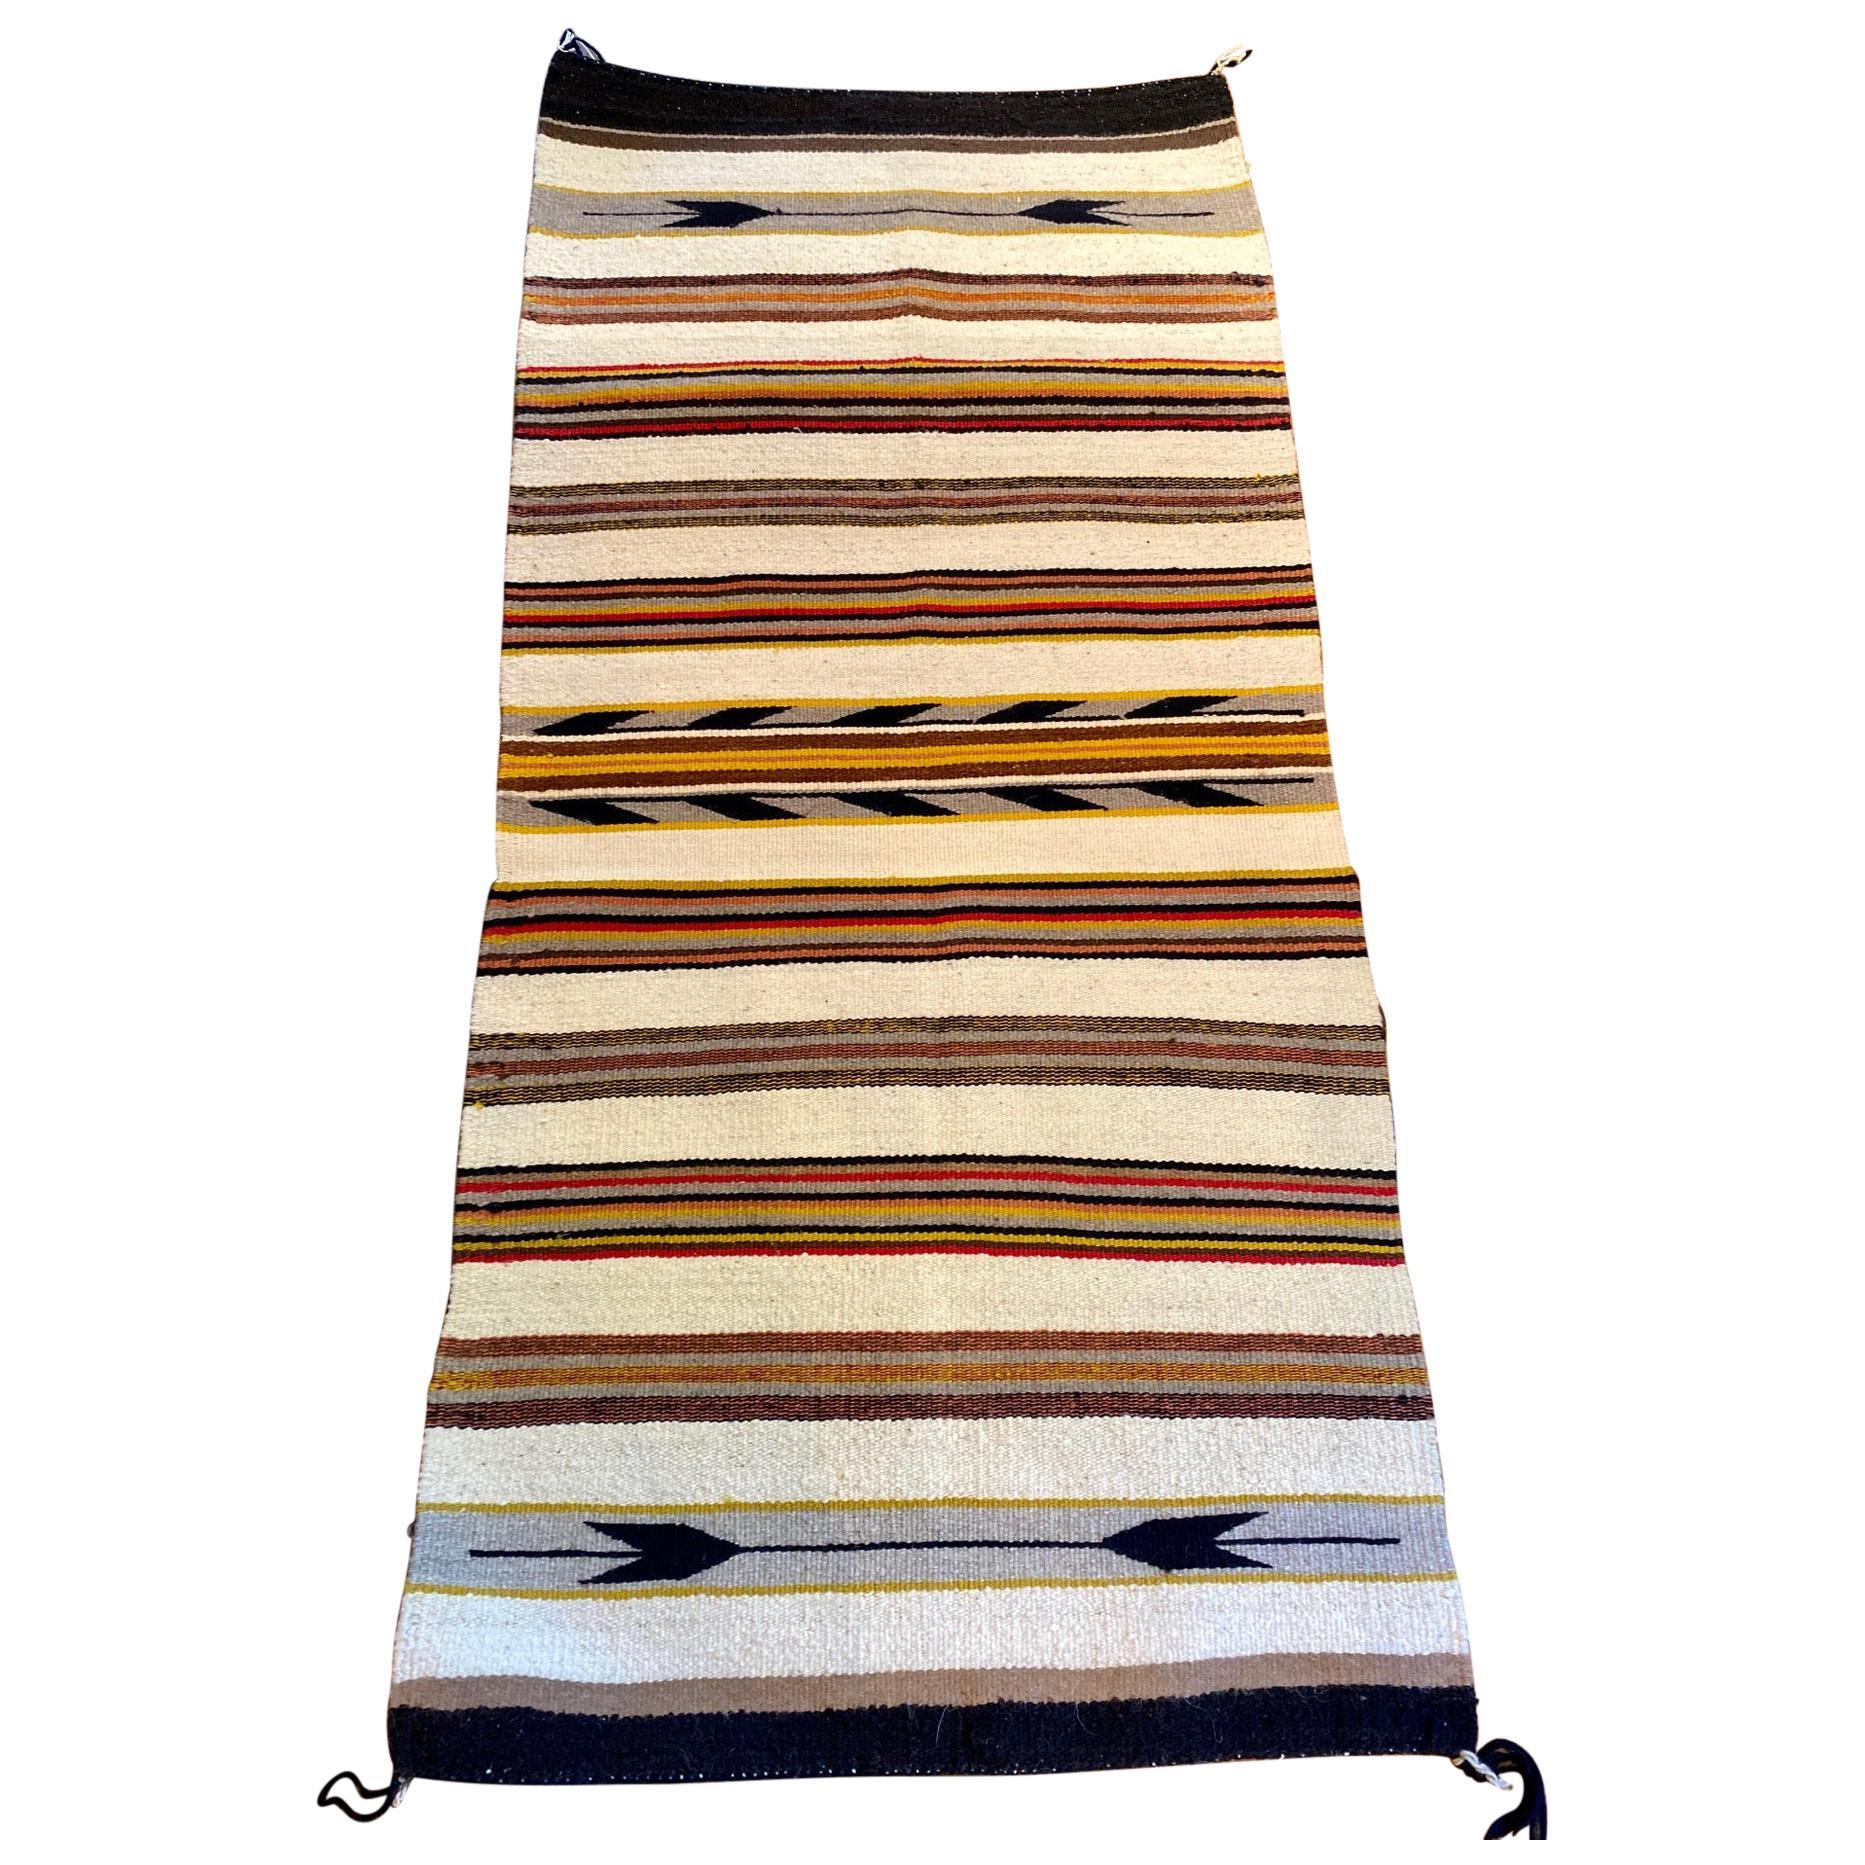 Navajo Rug, circa 1920s